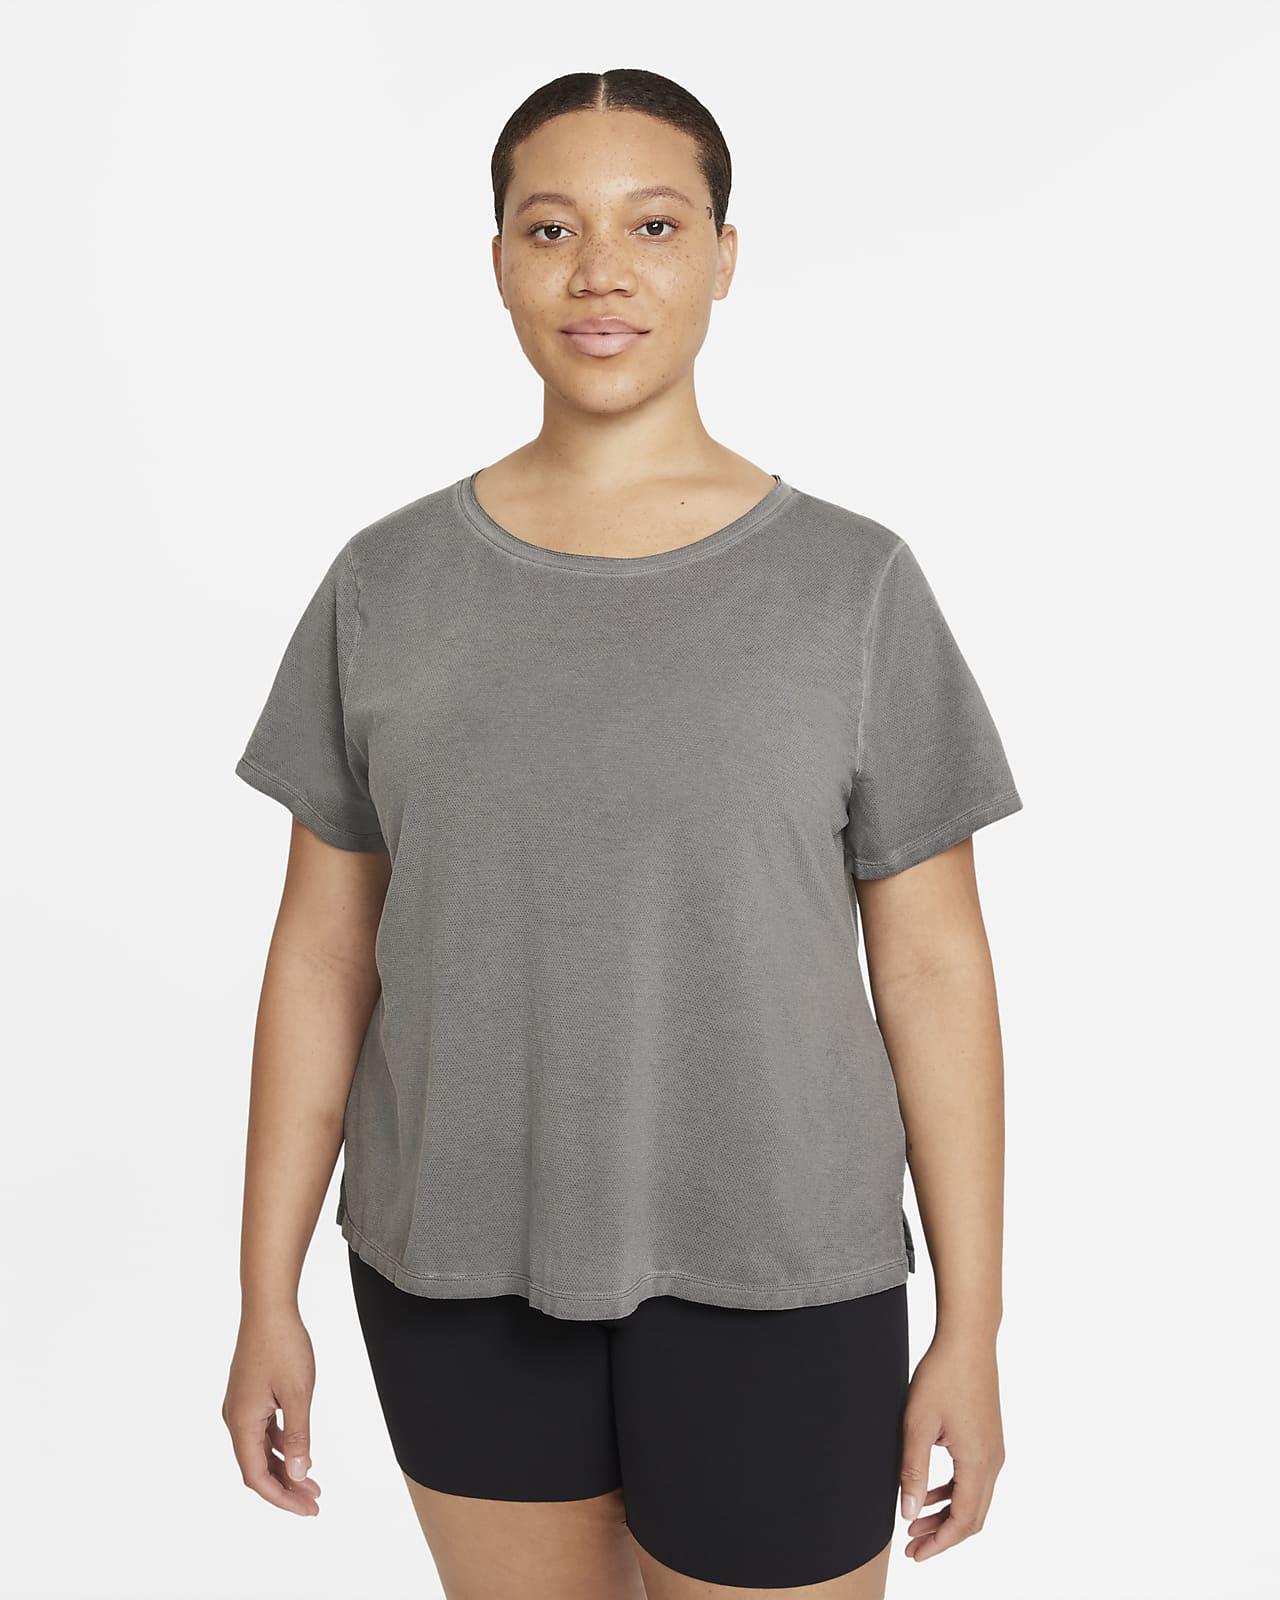 Nike Yoga Dri-FIT Women's Short-Sleeve Top (Plus Size)